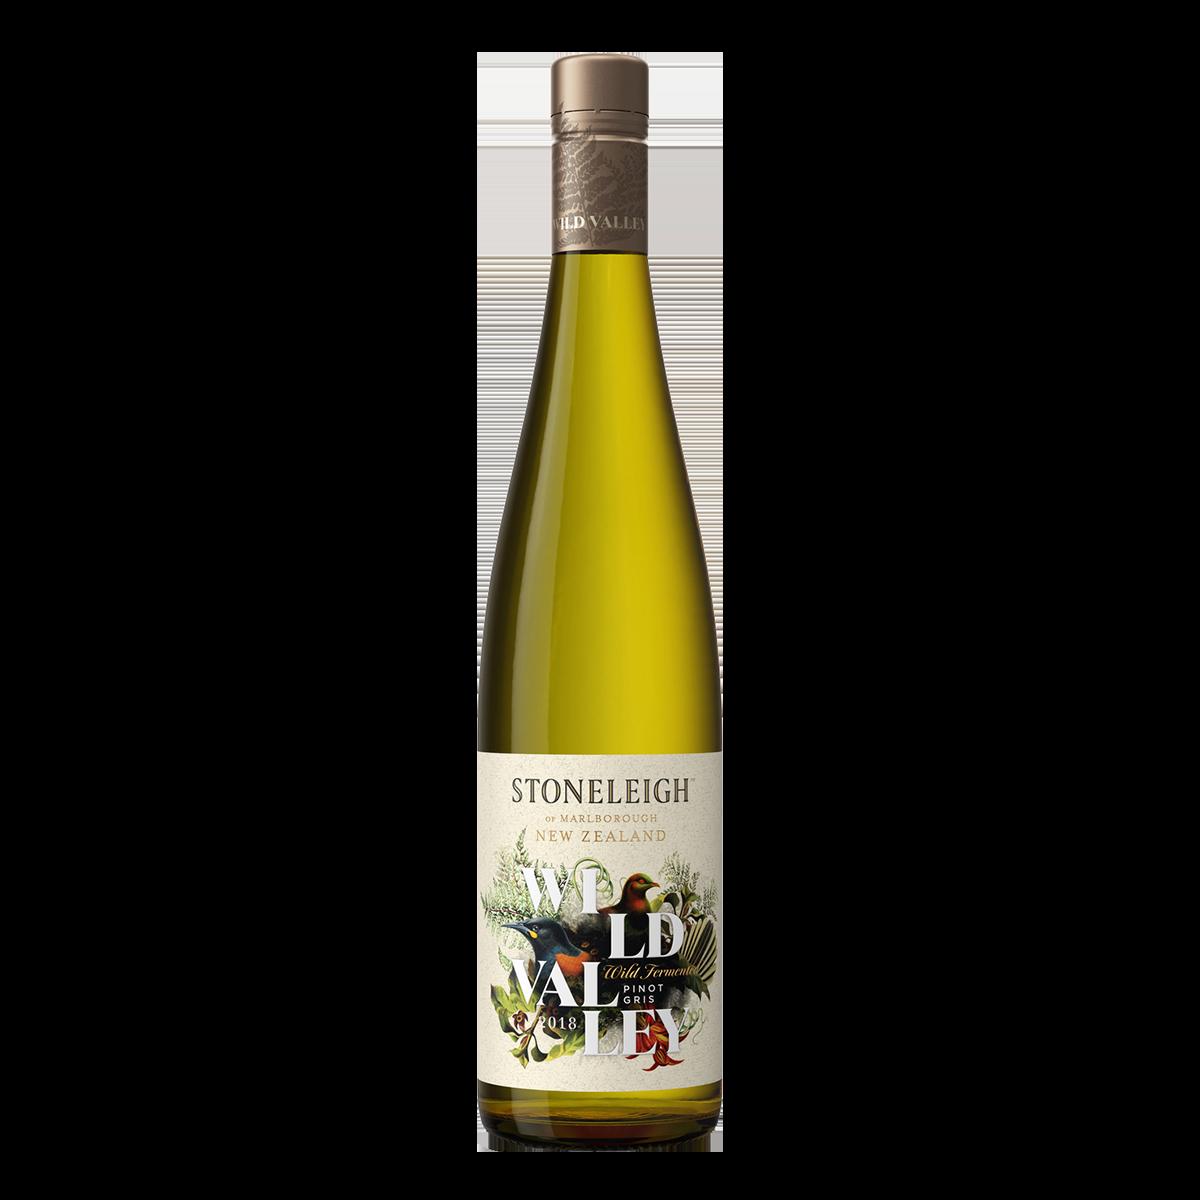 Stoneleigh Wild Valley Pinot Gris